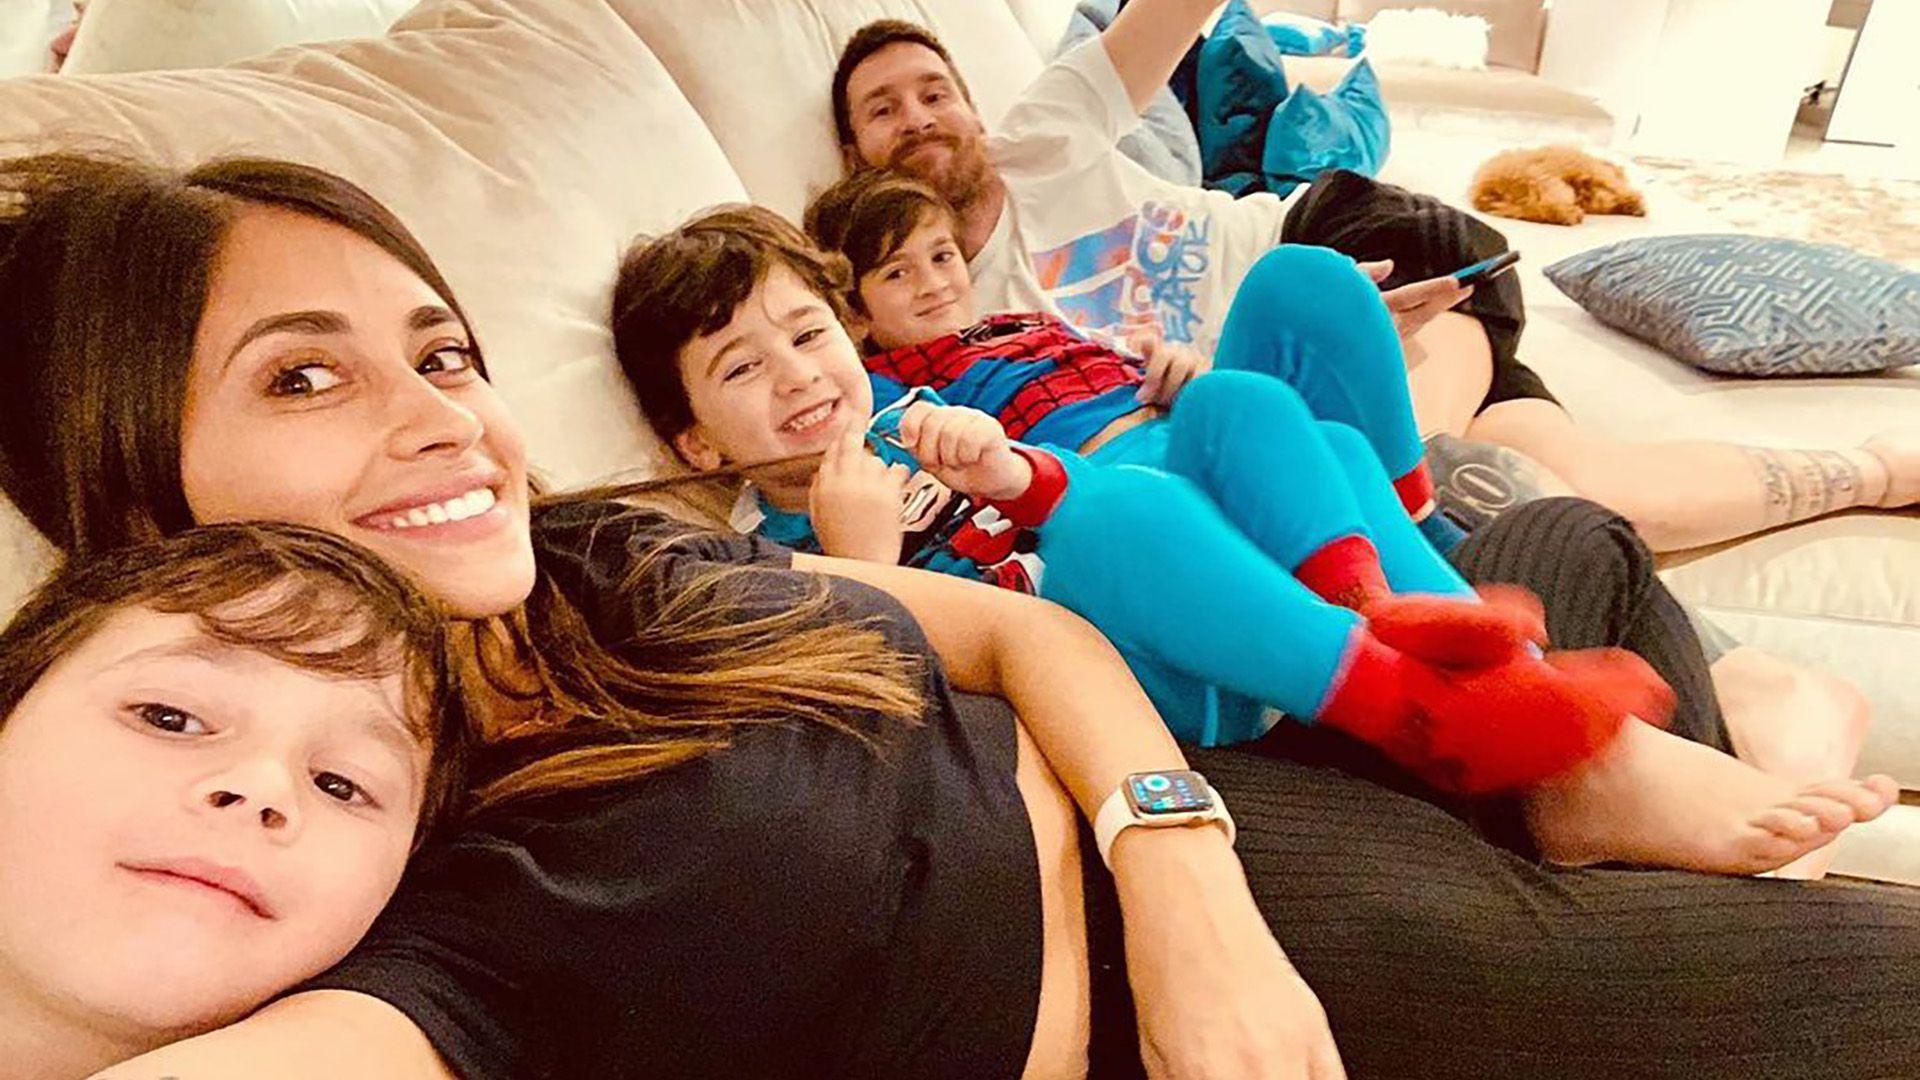 Antonela Roccuzo, la esposa de Messi, junto a su familia